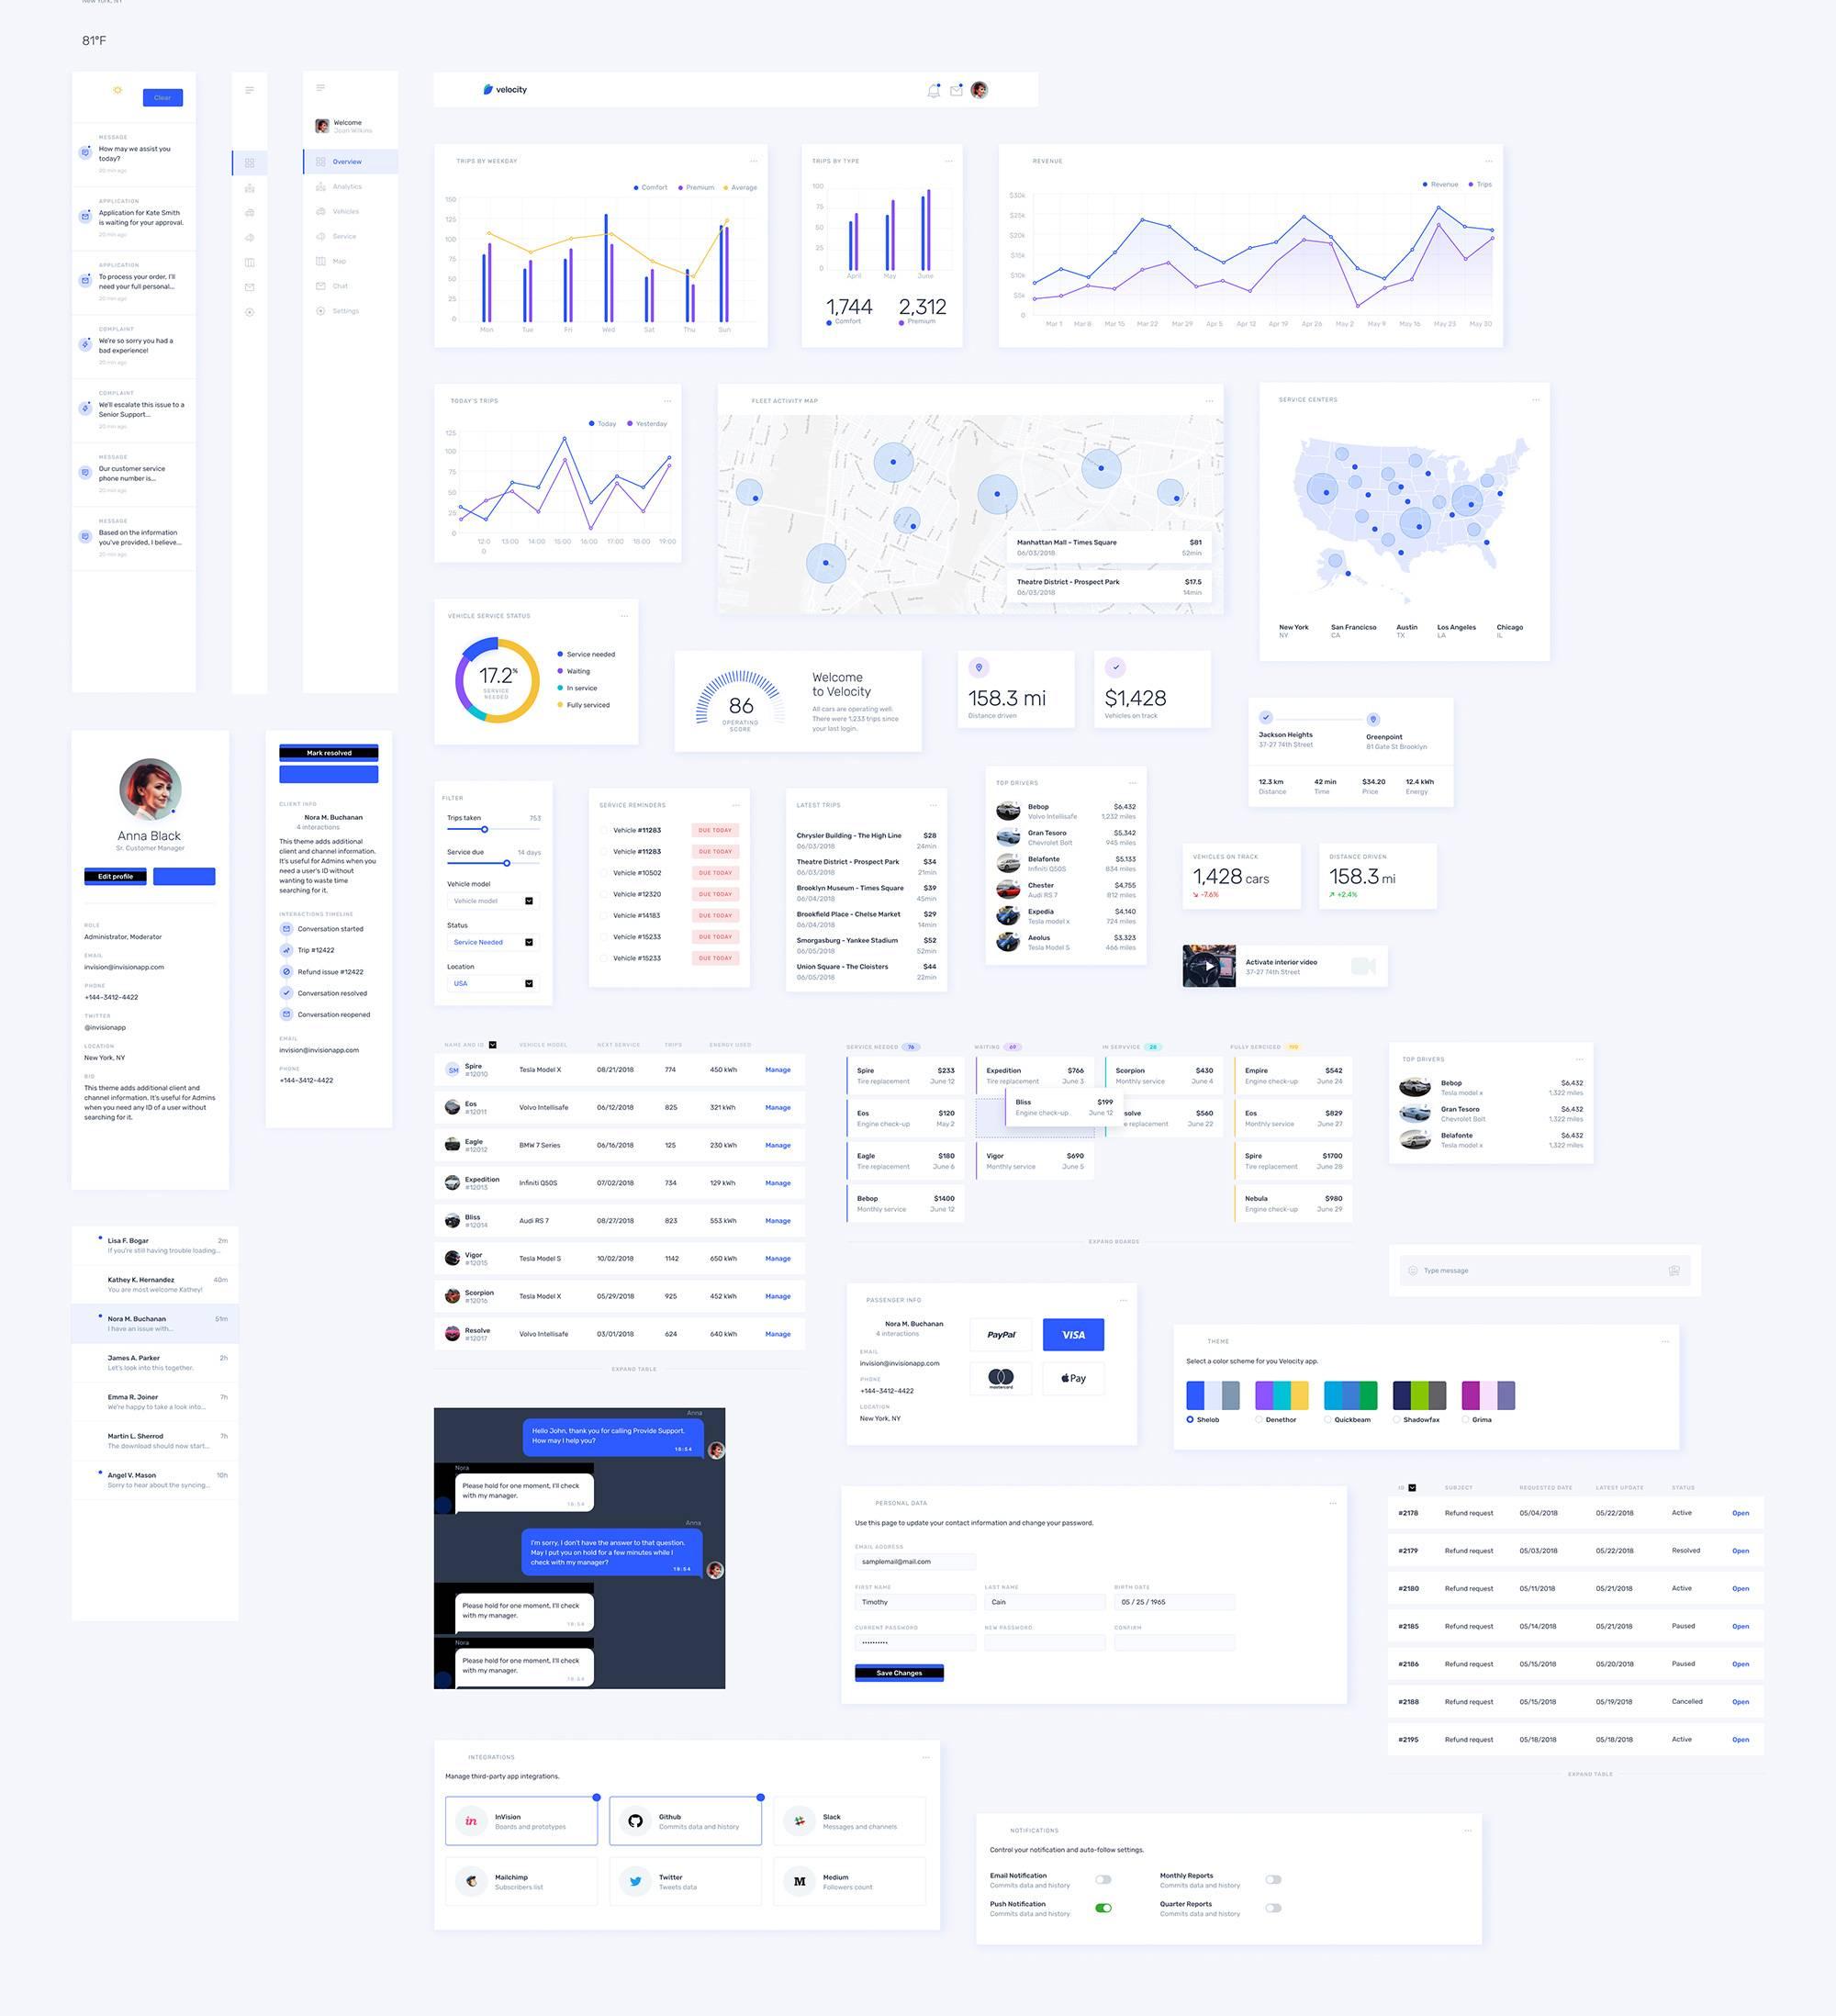 Velocity dashboard设计工具集uikit主题包 .sketch&.psd素材下载 主题包-第1张